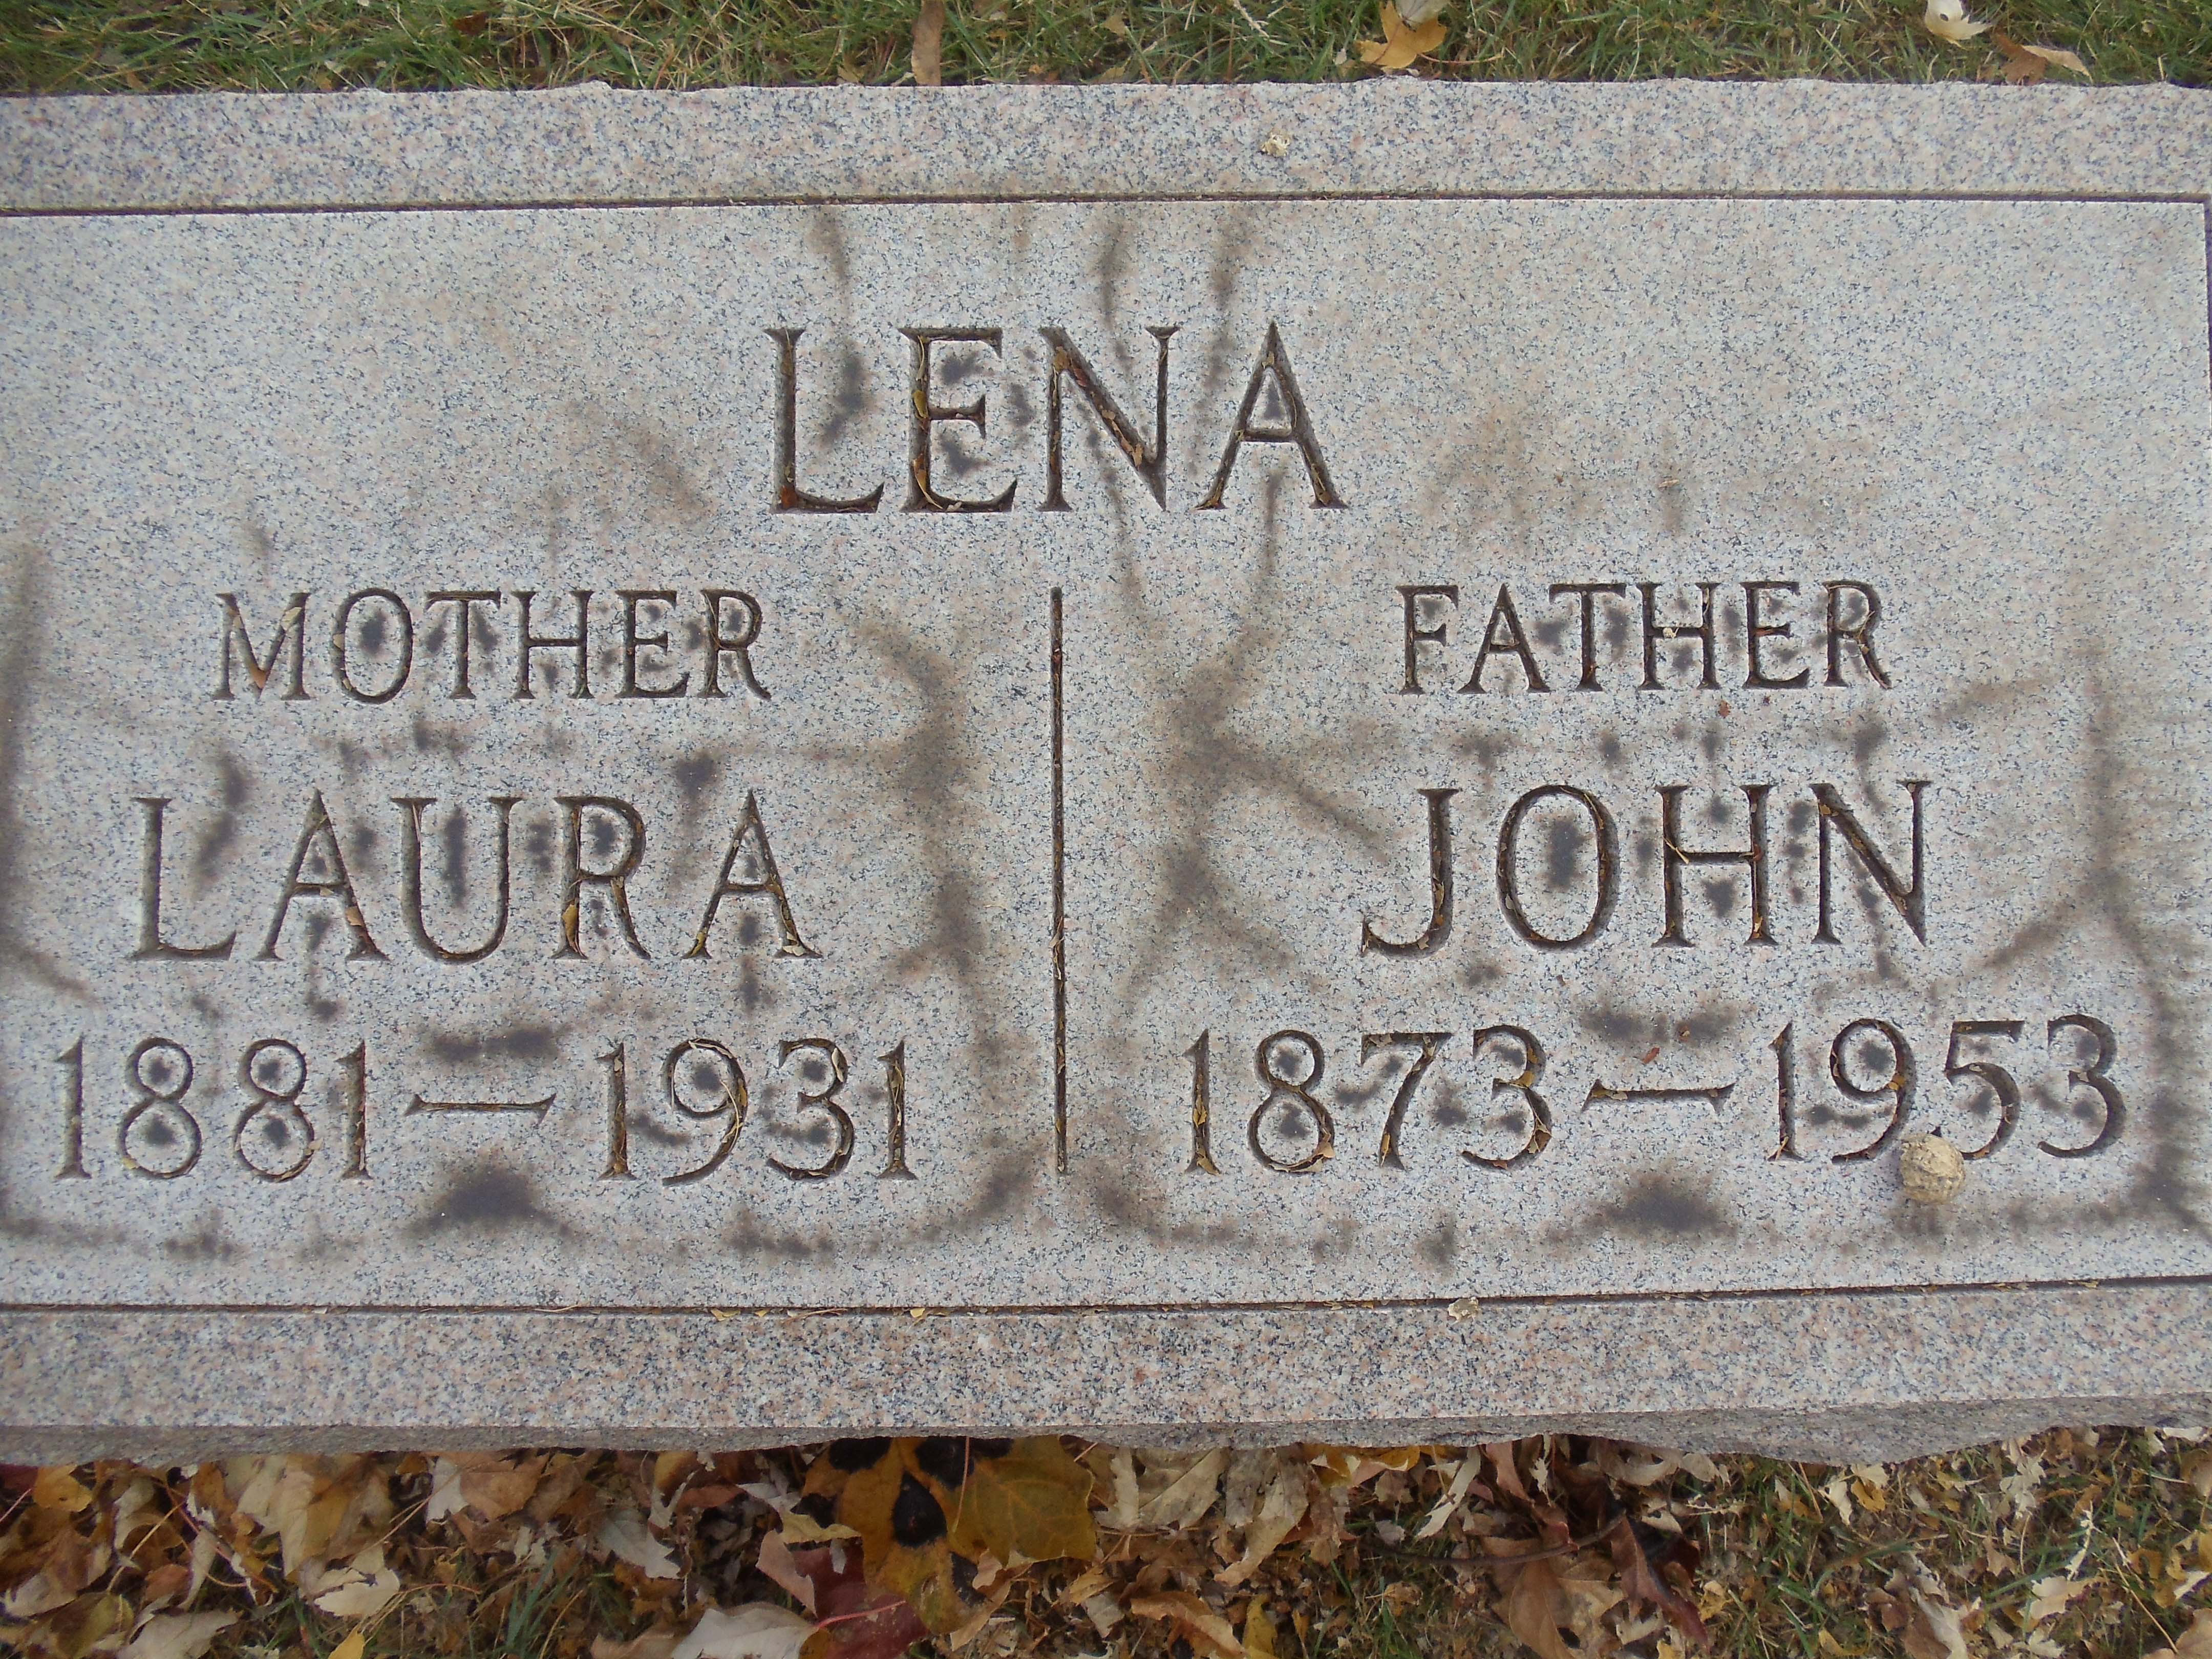 John Lena